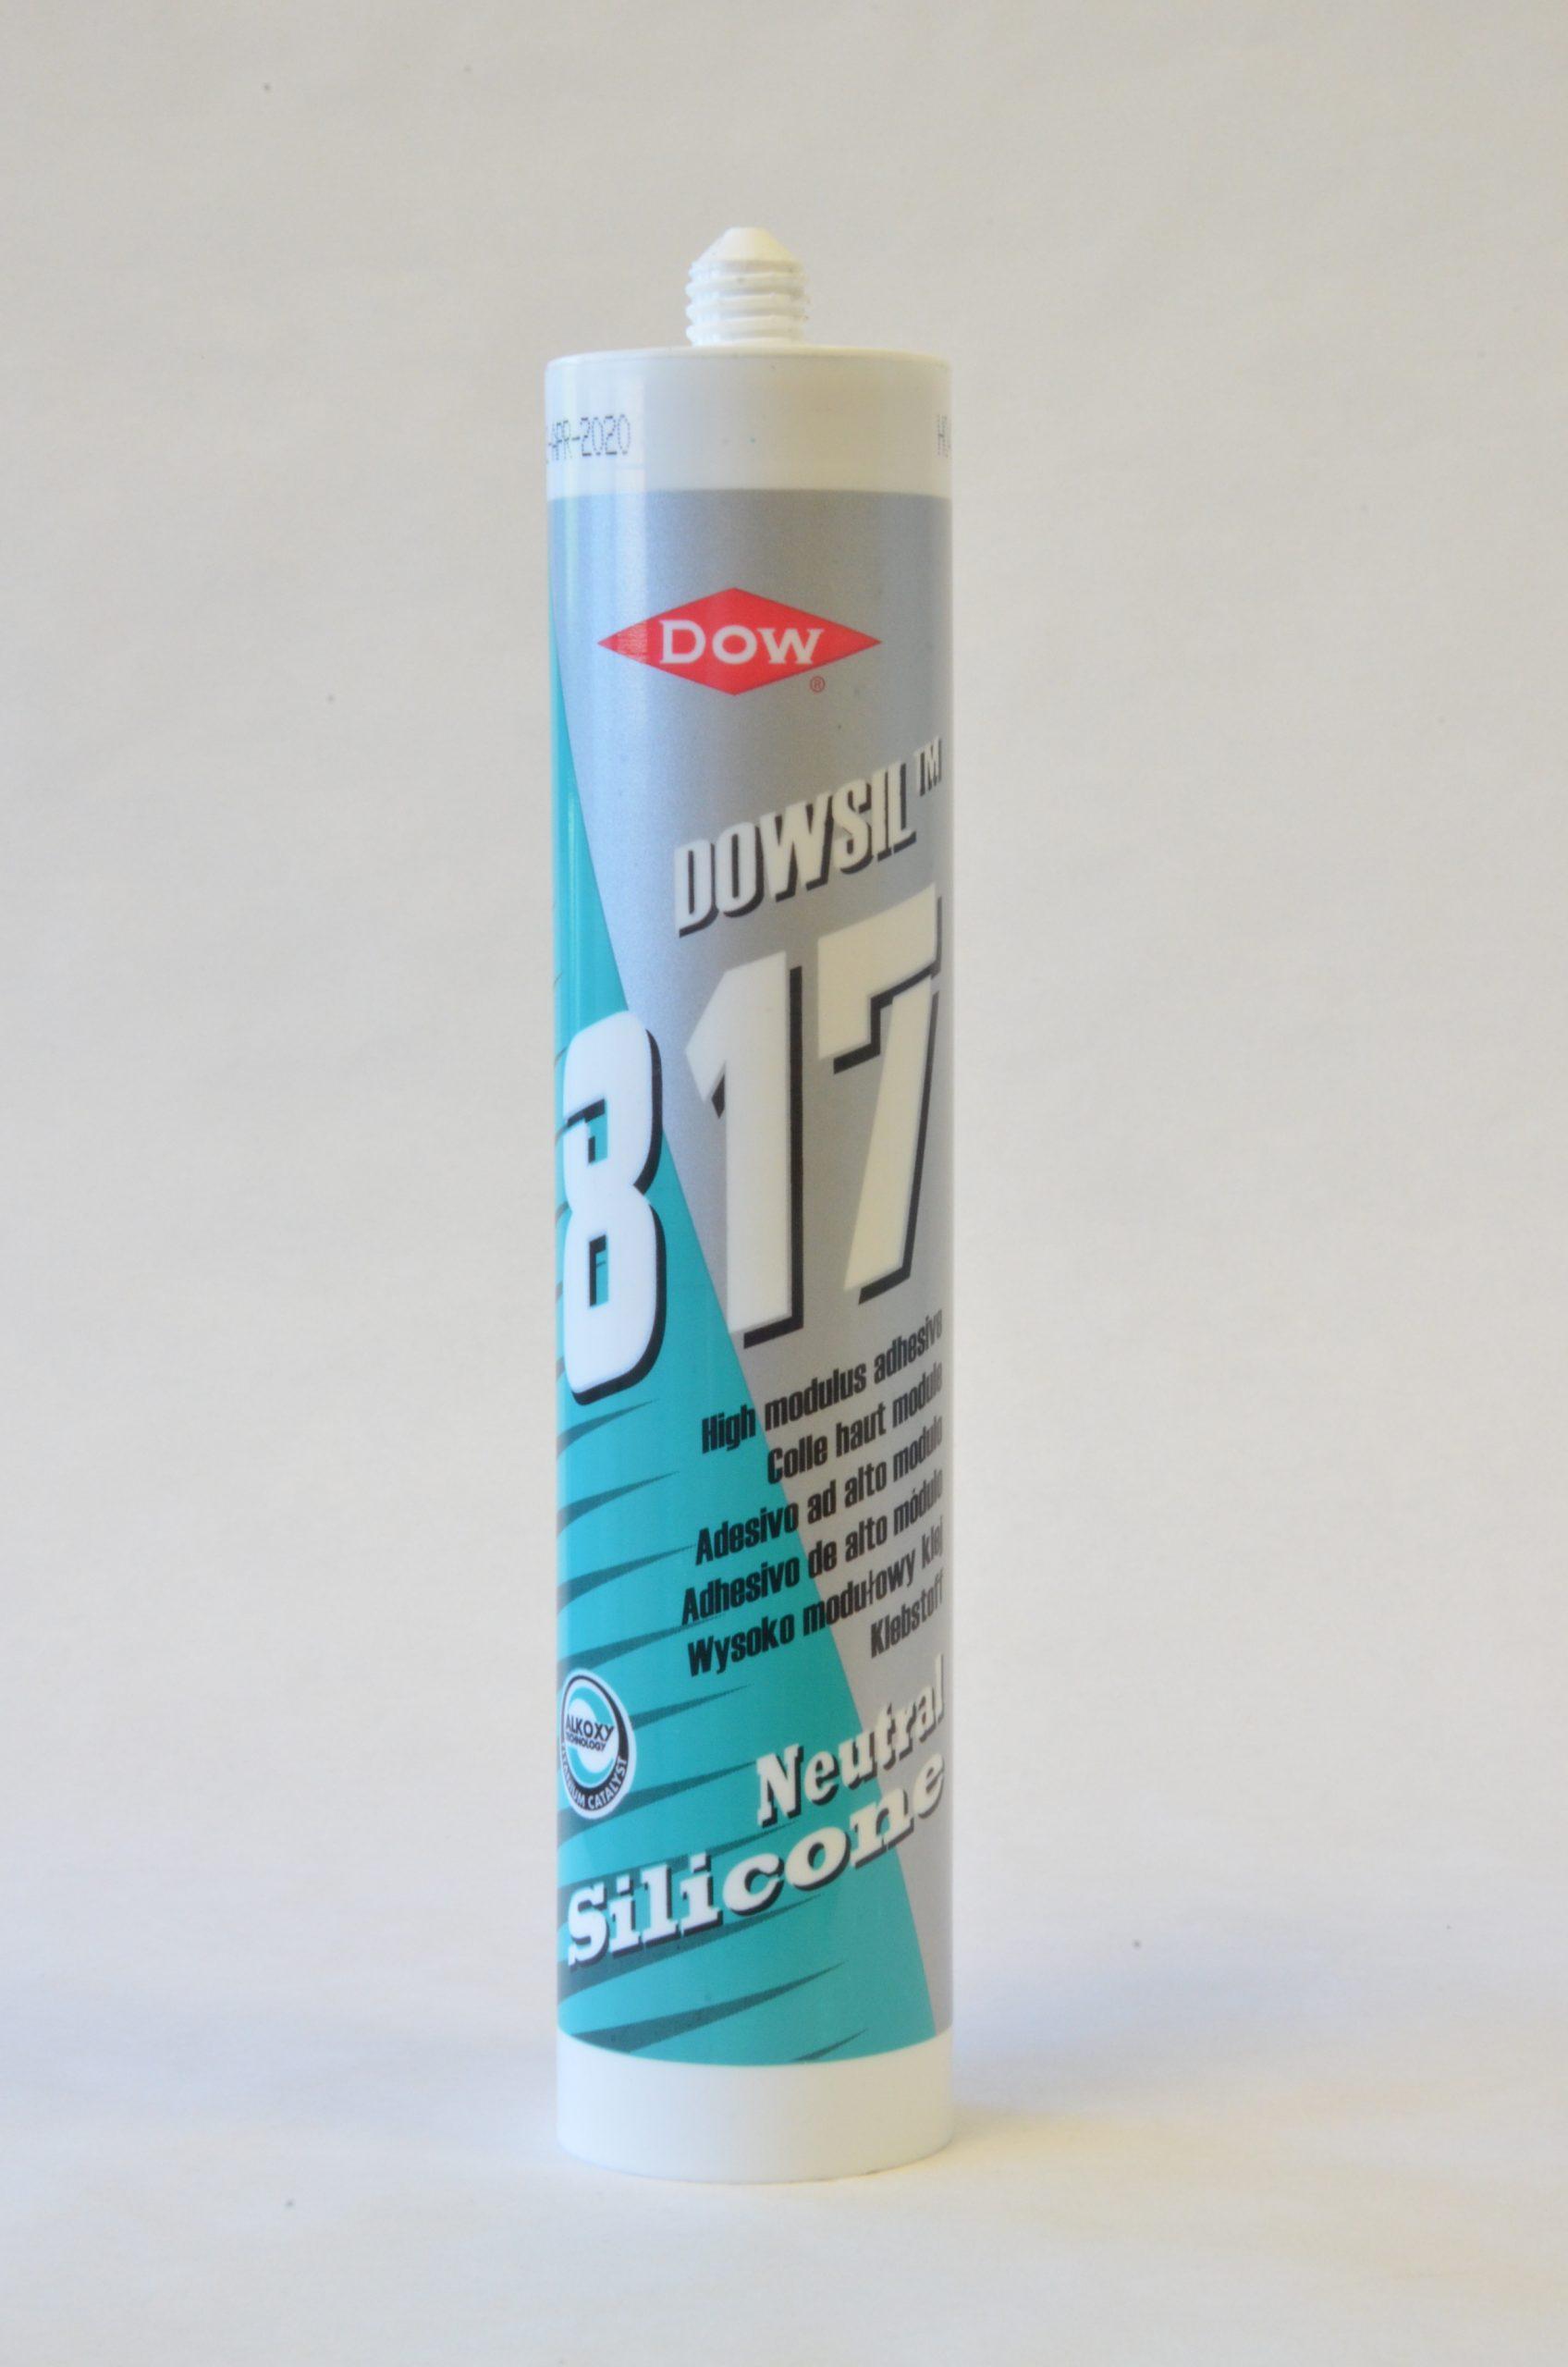 Dowsil 817